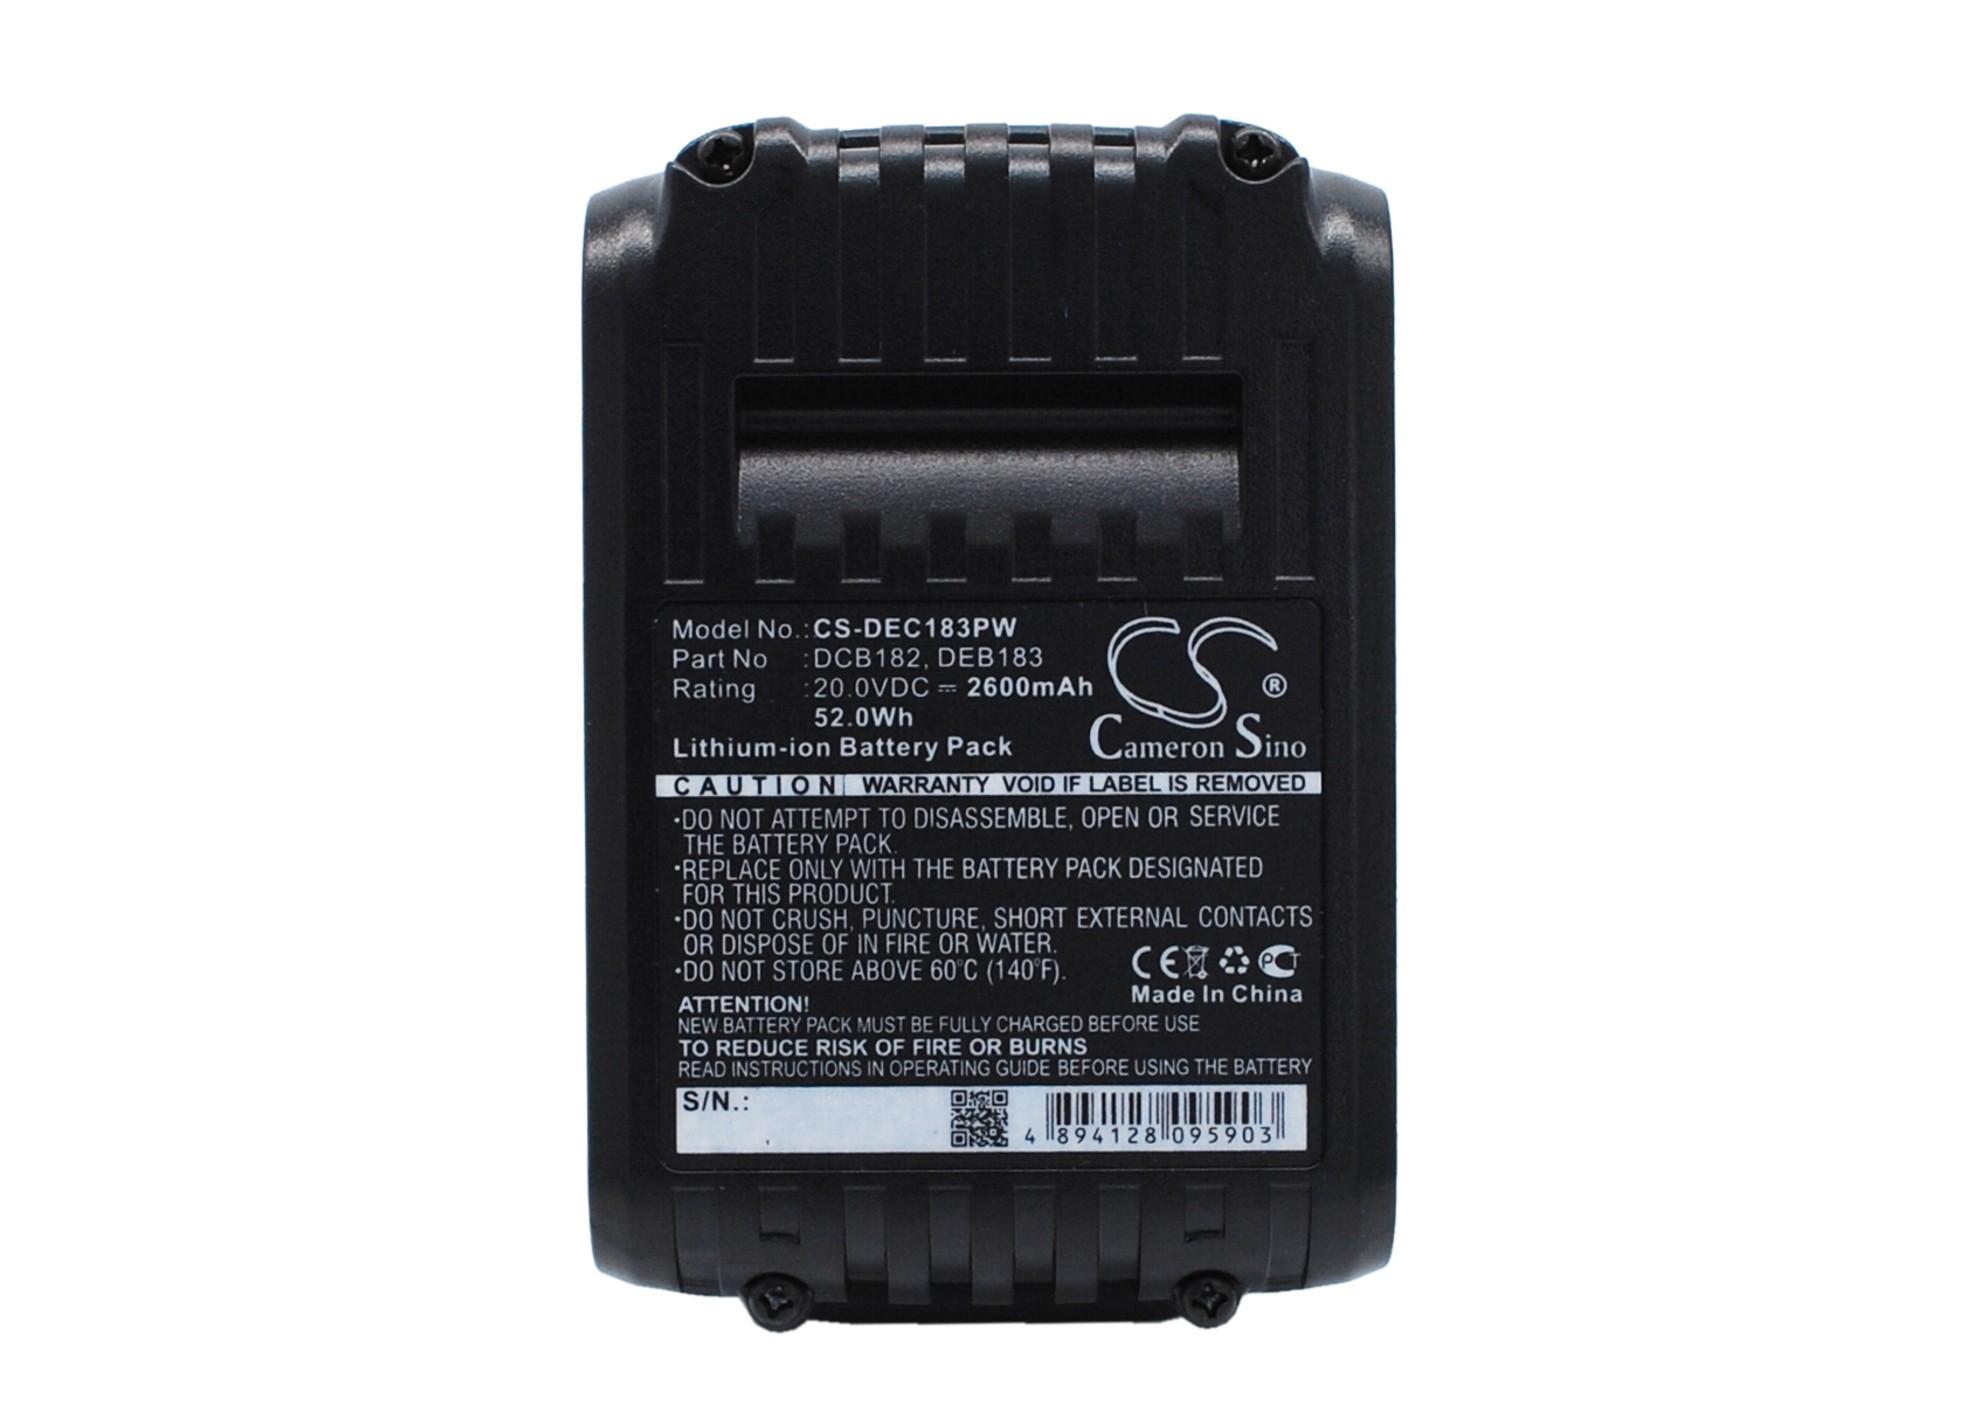 Cameron Sino baterie do nářadí pro DEWALT DCD780N 20V Li-ion 2600mAh černá - neoriginální